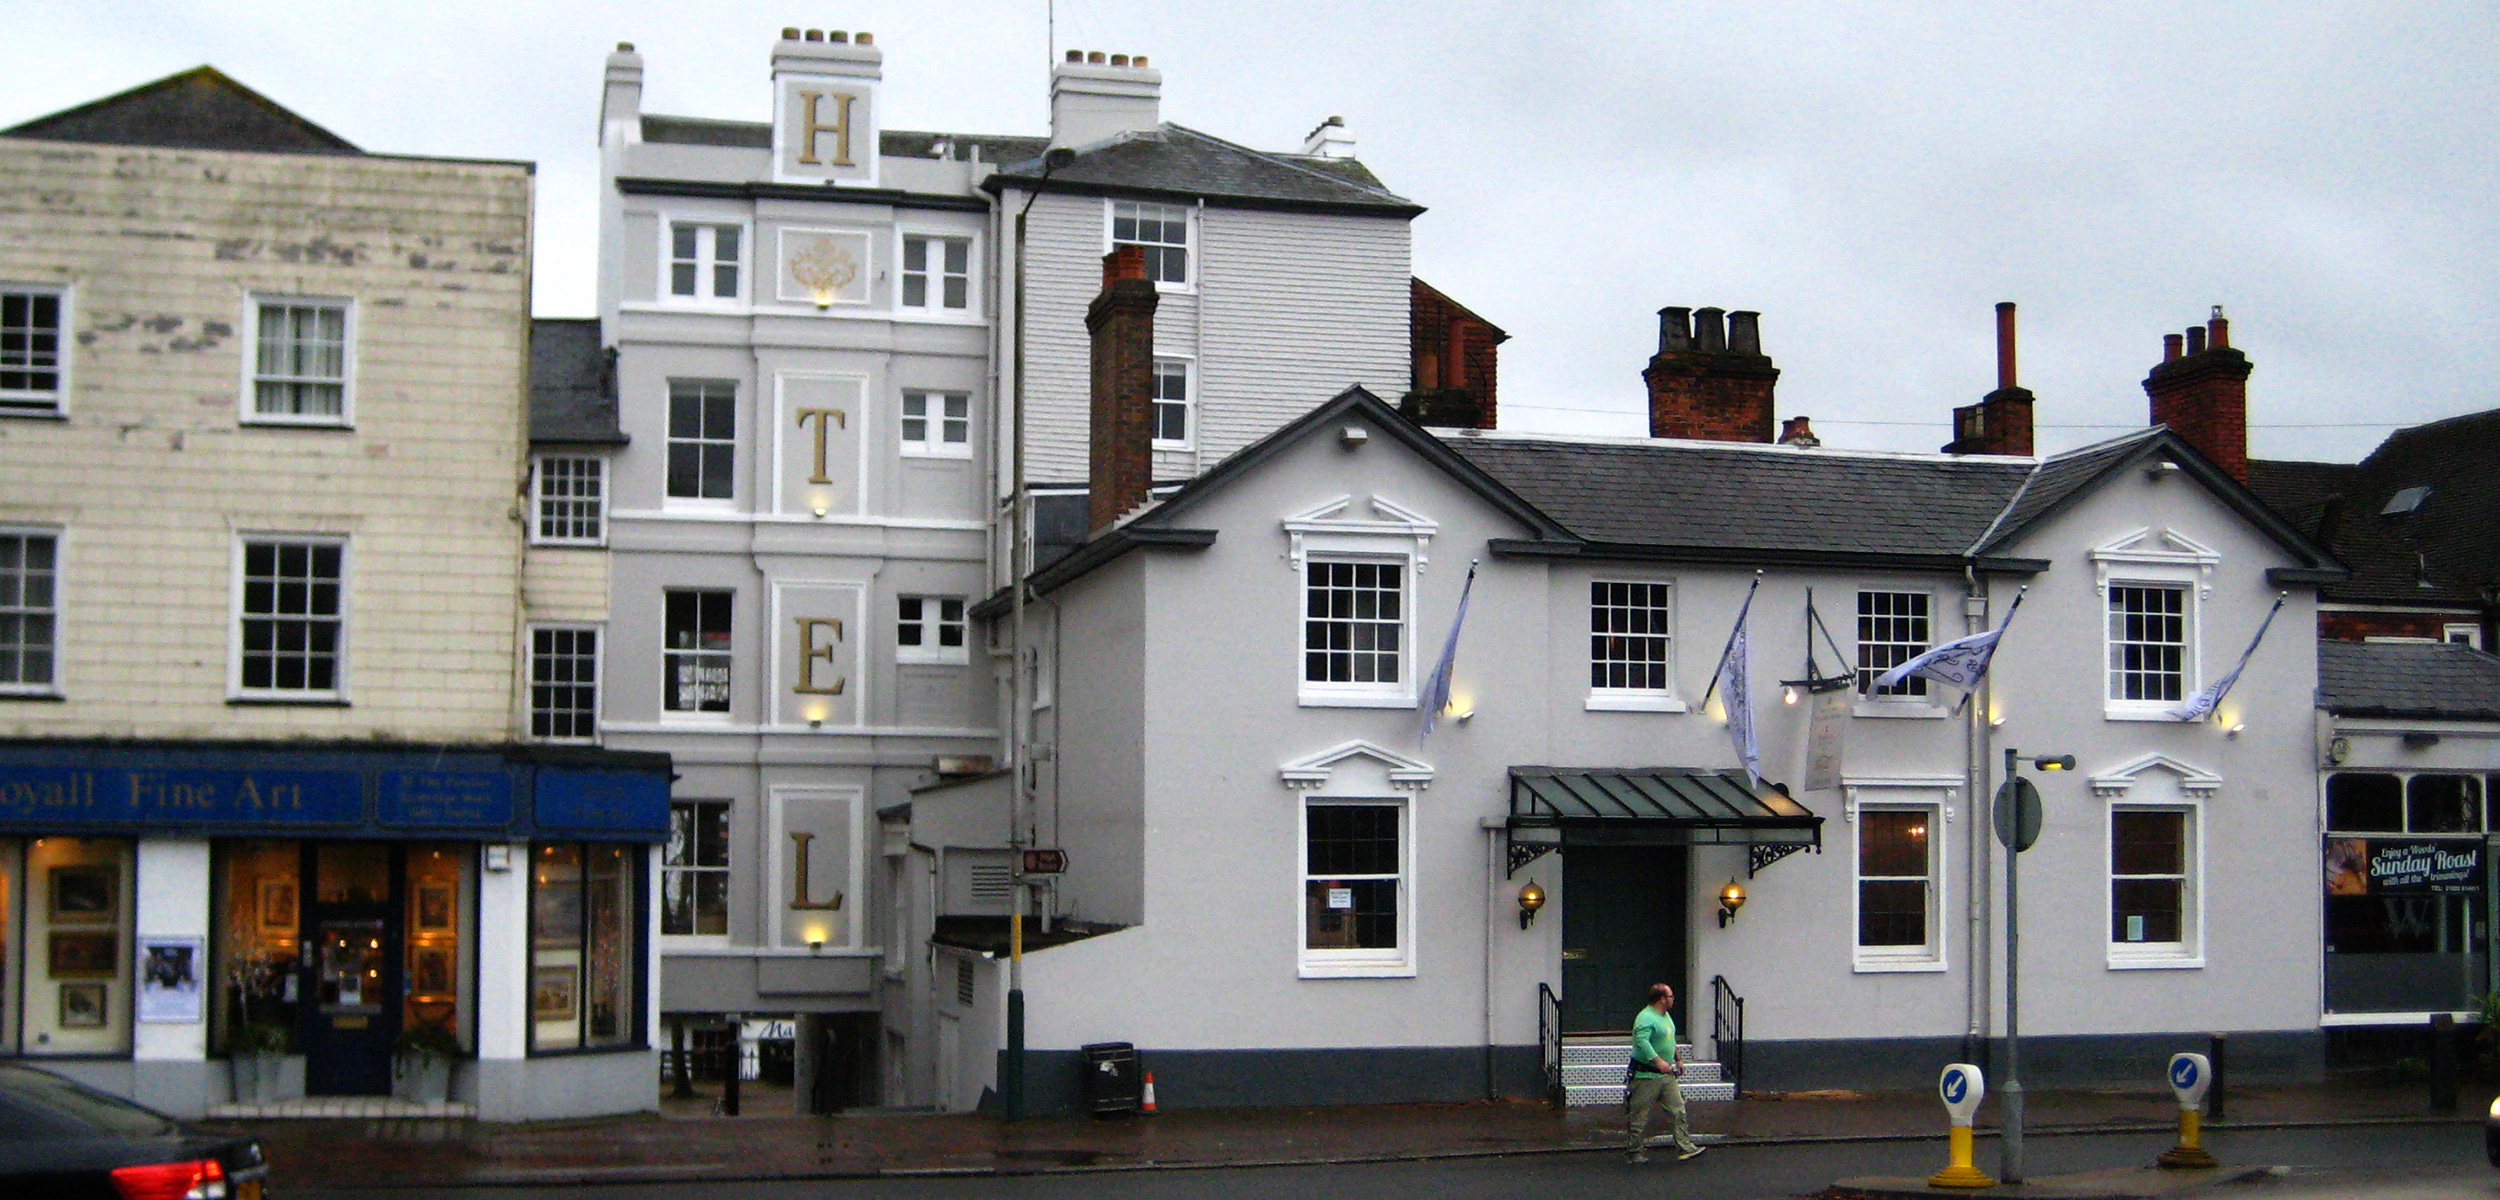 THE TUNBRIDGE WELLS HOTEL - complete refurbishment